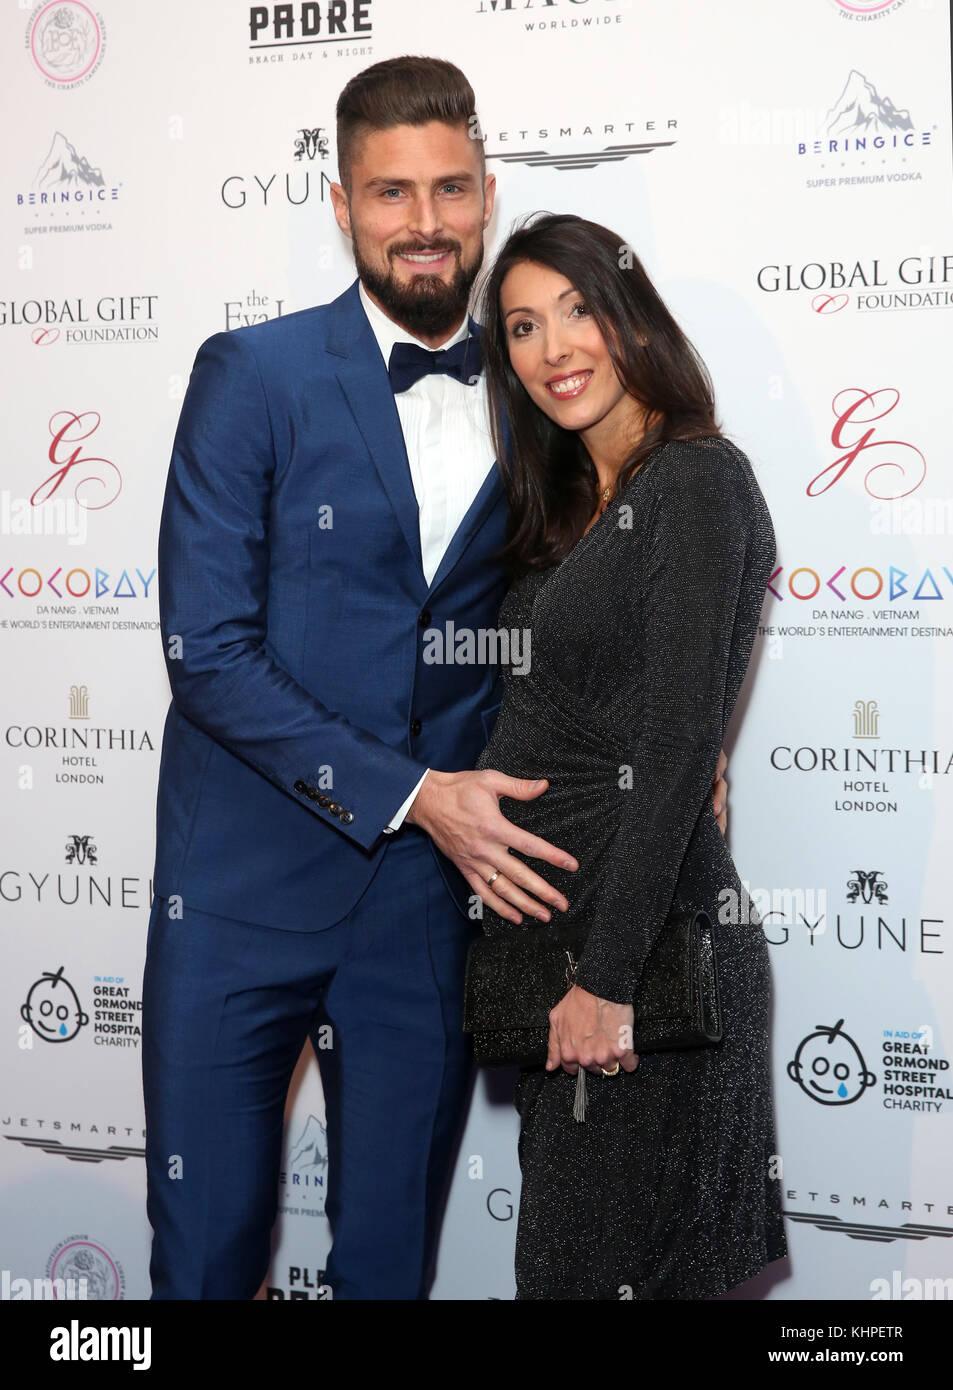 Olivier Giroud And Jennifer Giroud Attending The Global Gift Gala Stock Photo Alamy